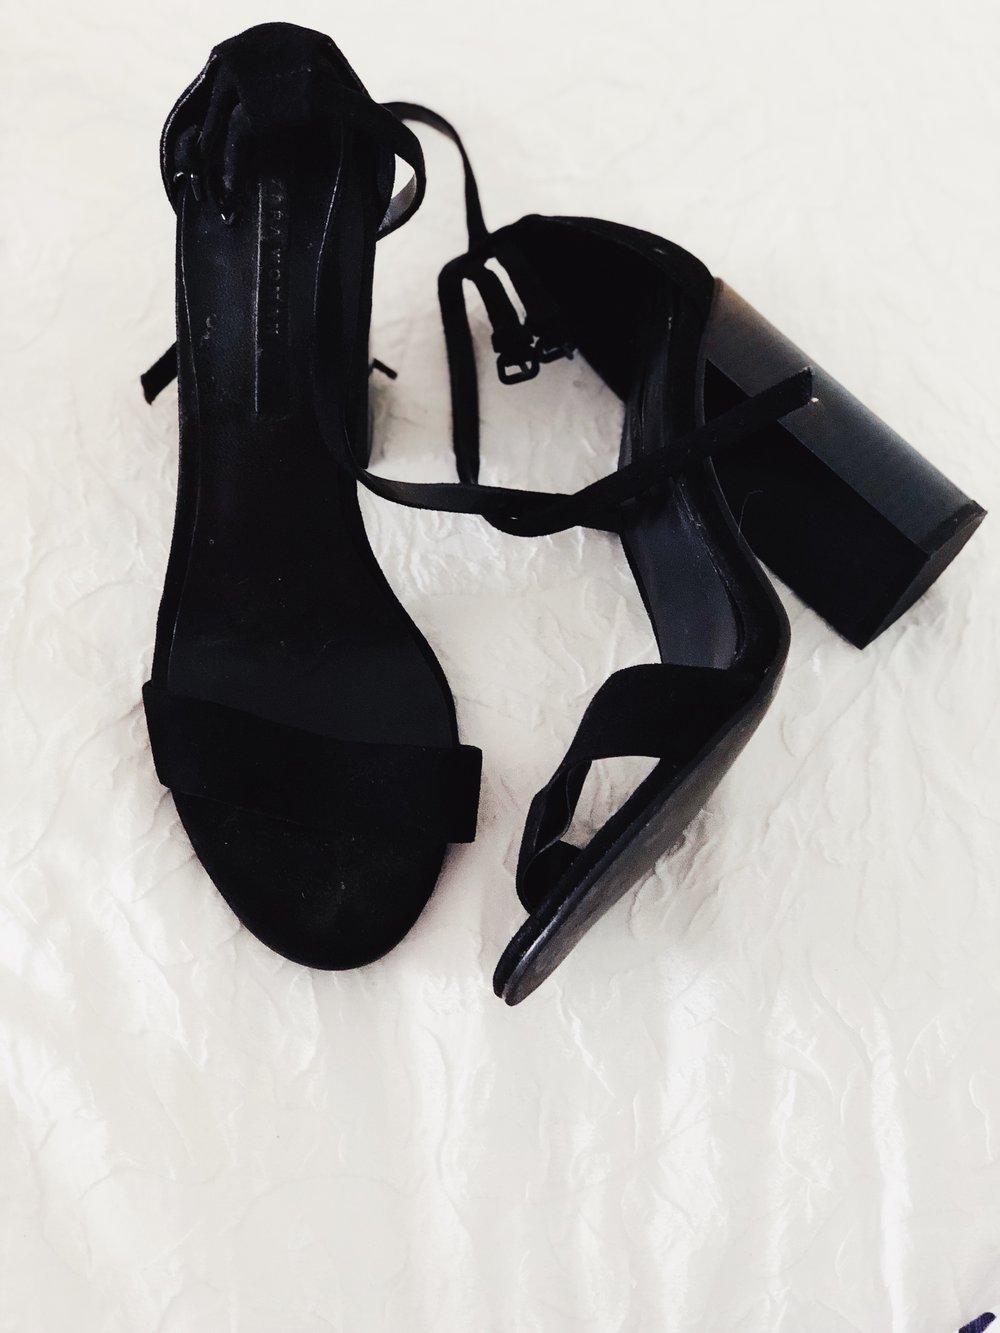 Black, Please